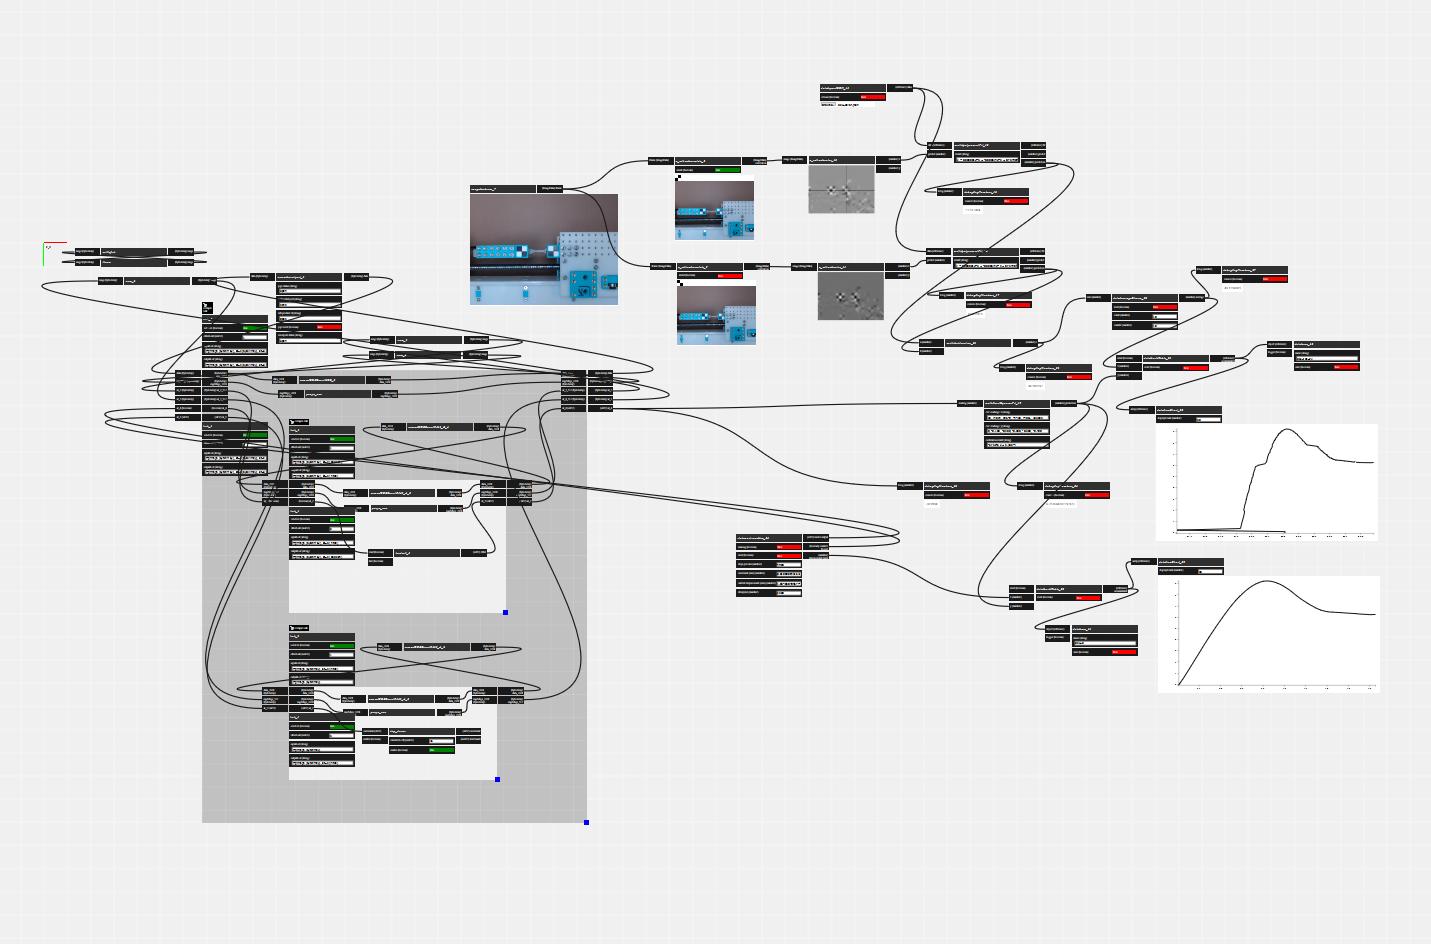 images/2019-11_dex-vision-controller.png